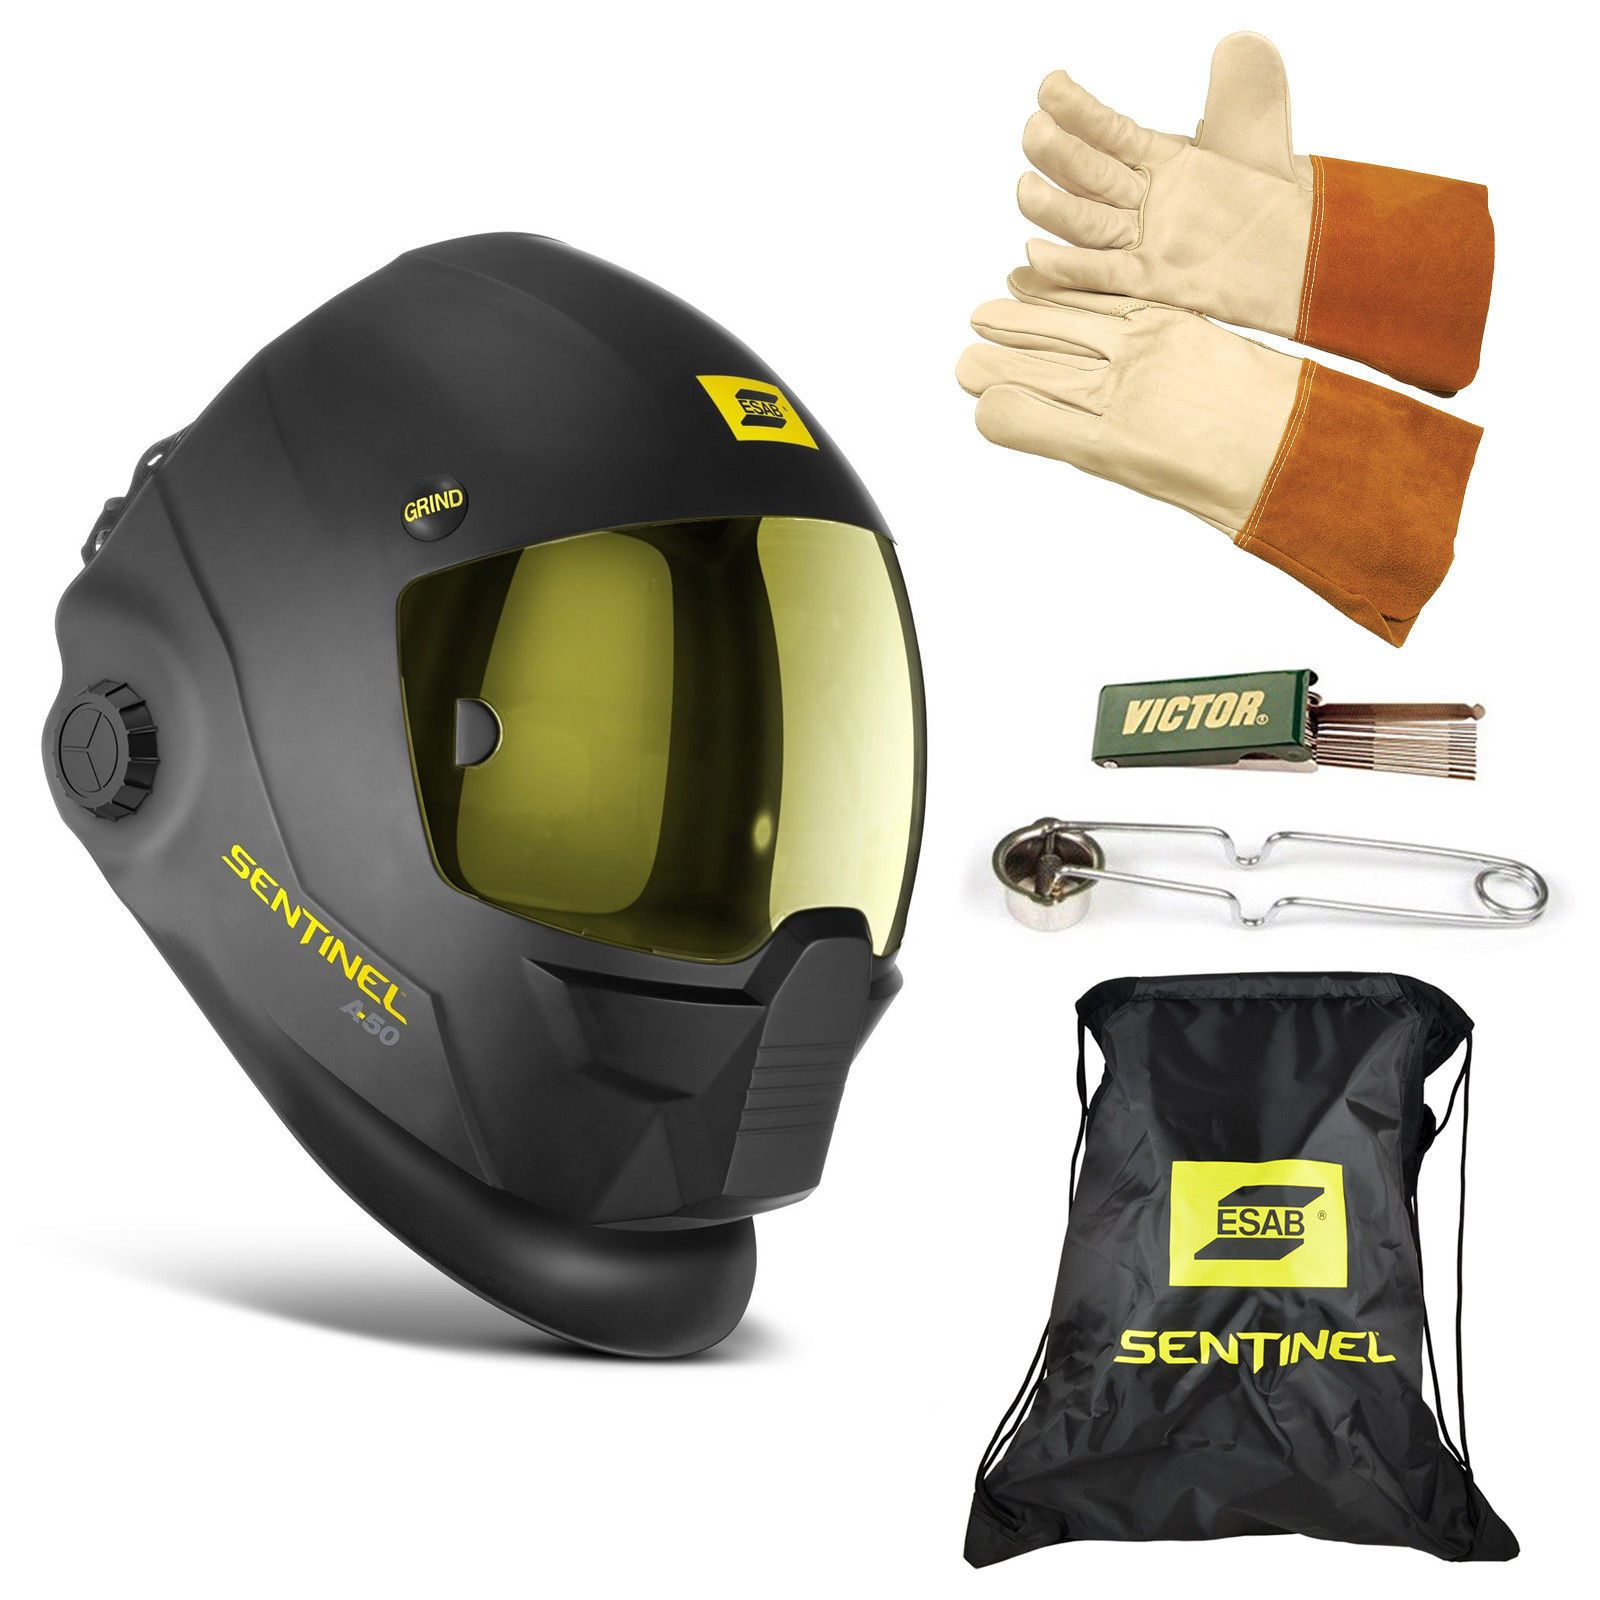 lincoln auto helmet welding lcd techno mask darkening en lovely helmets gys of pipeline